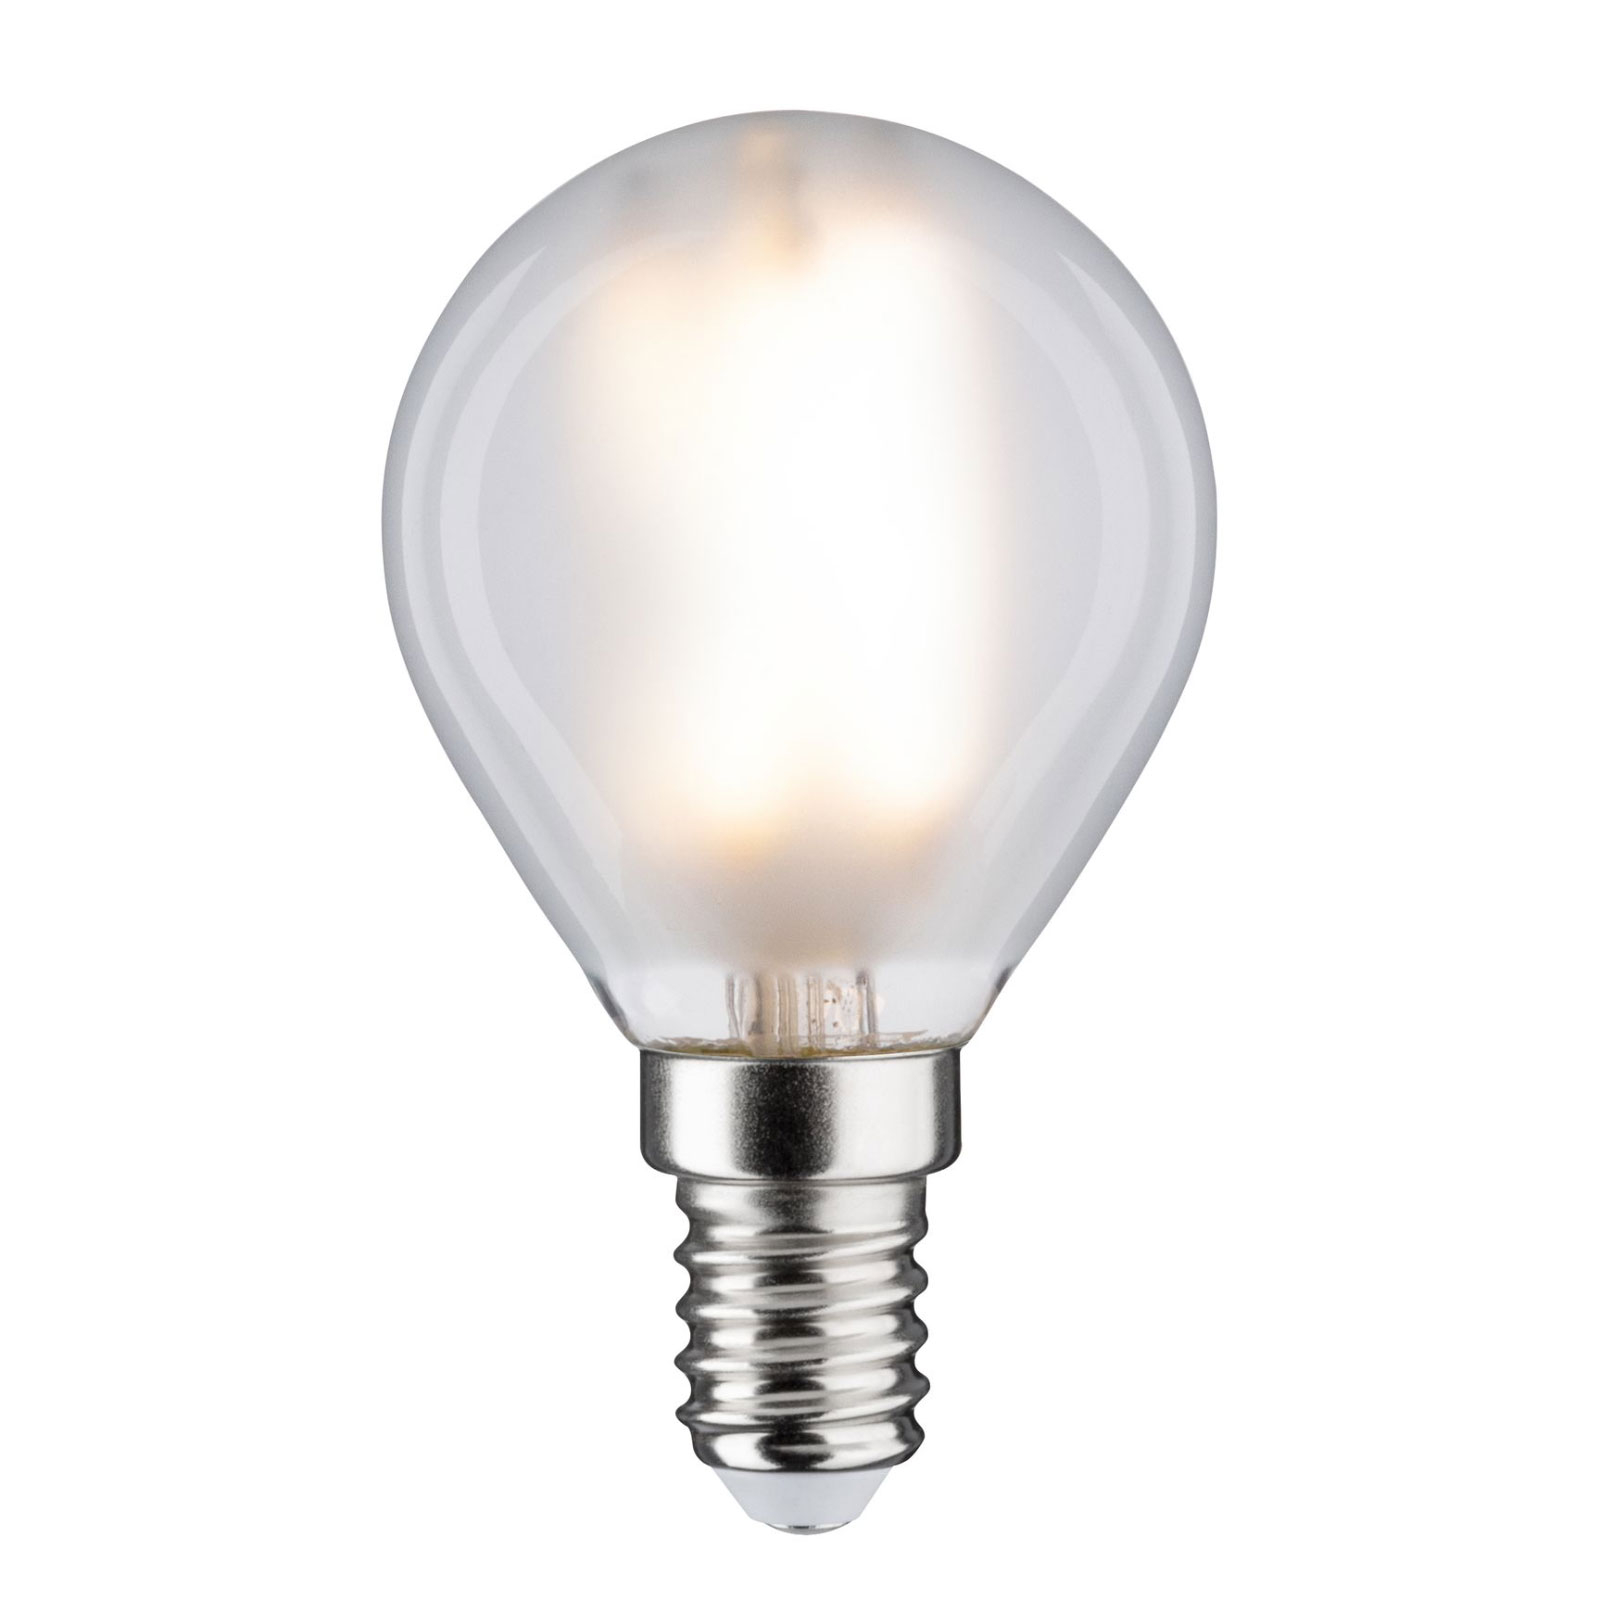 LED-Tropfenlampe E14 P45 5W 840 matt dimmbar